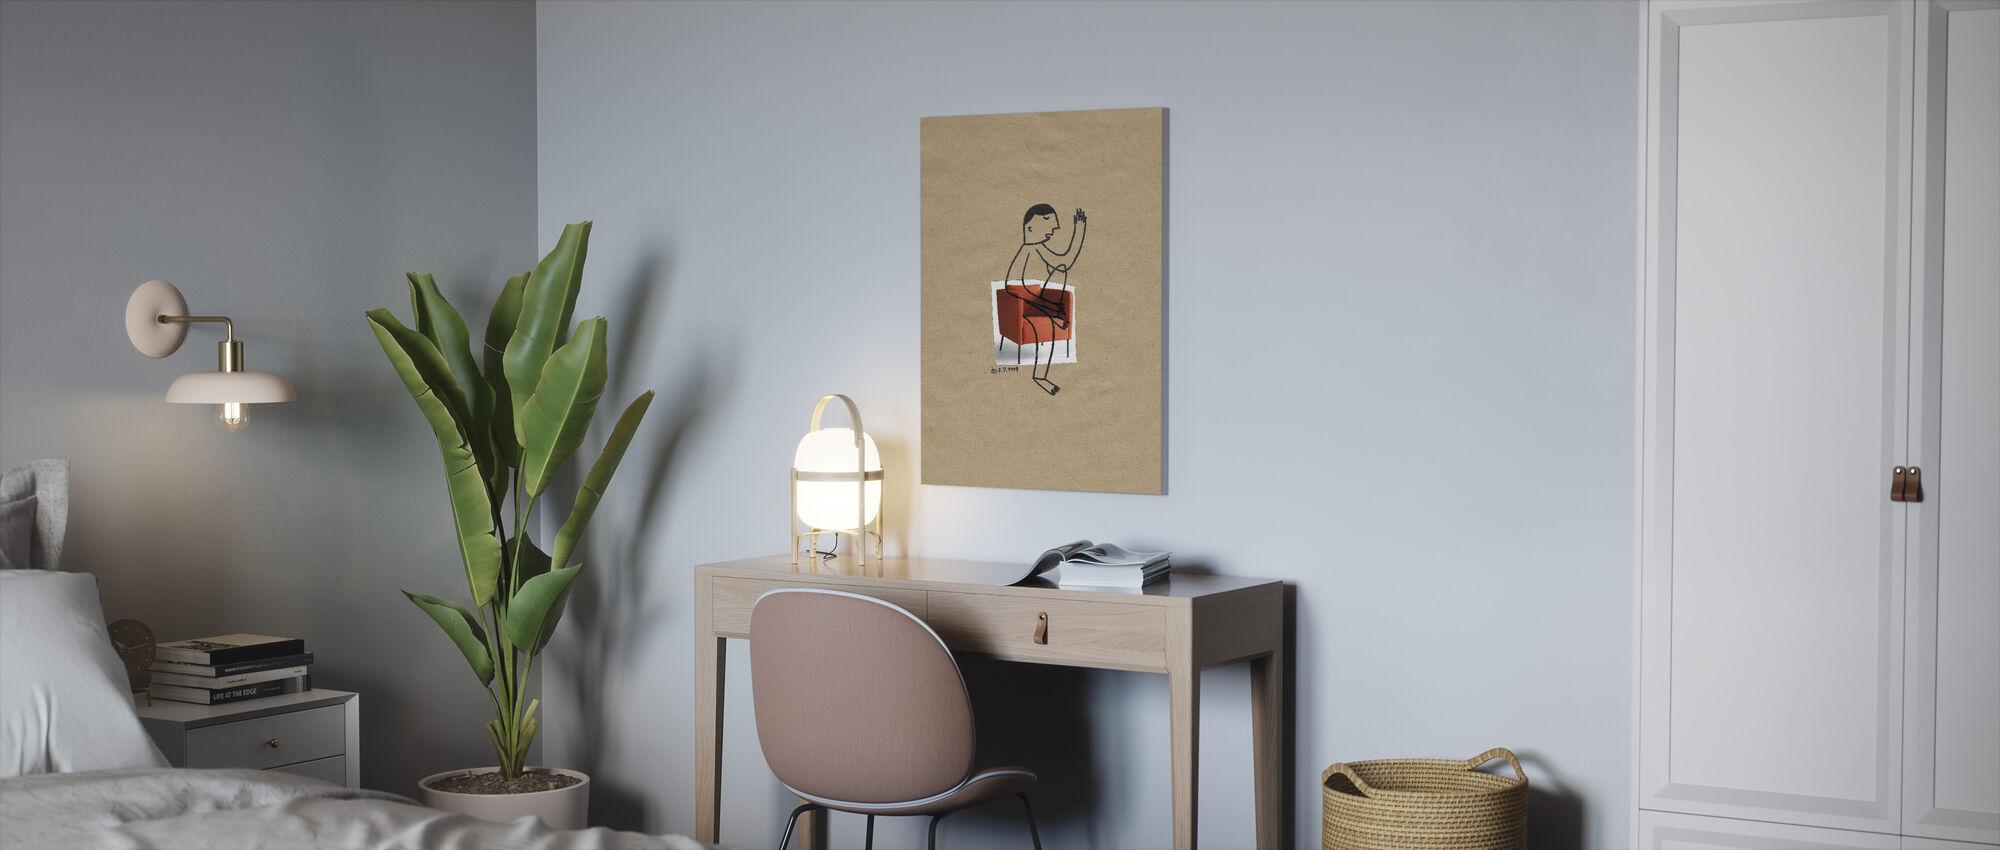 Man Sitting - Canvas print - Office